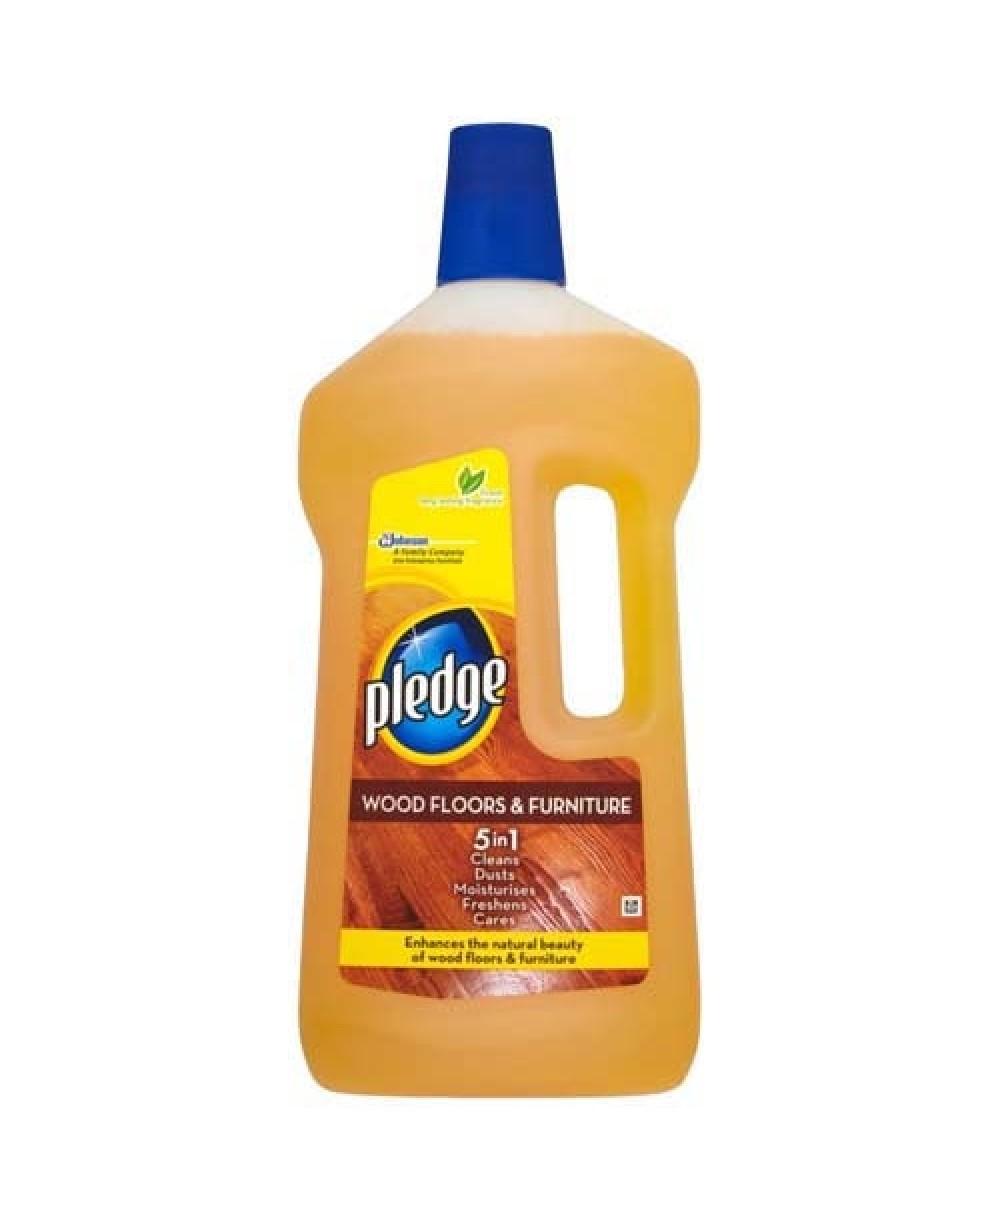 Pledge Wood 5 1 Soapy Floor Cleaner 750ml 33 Extra X 6